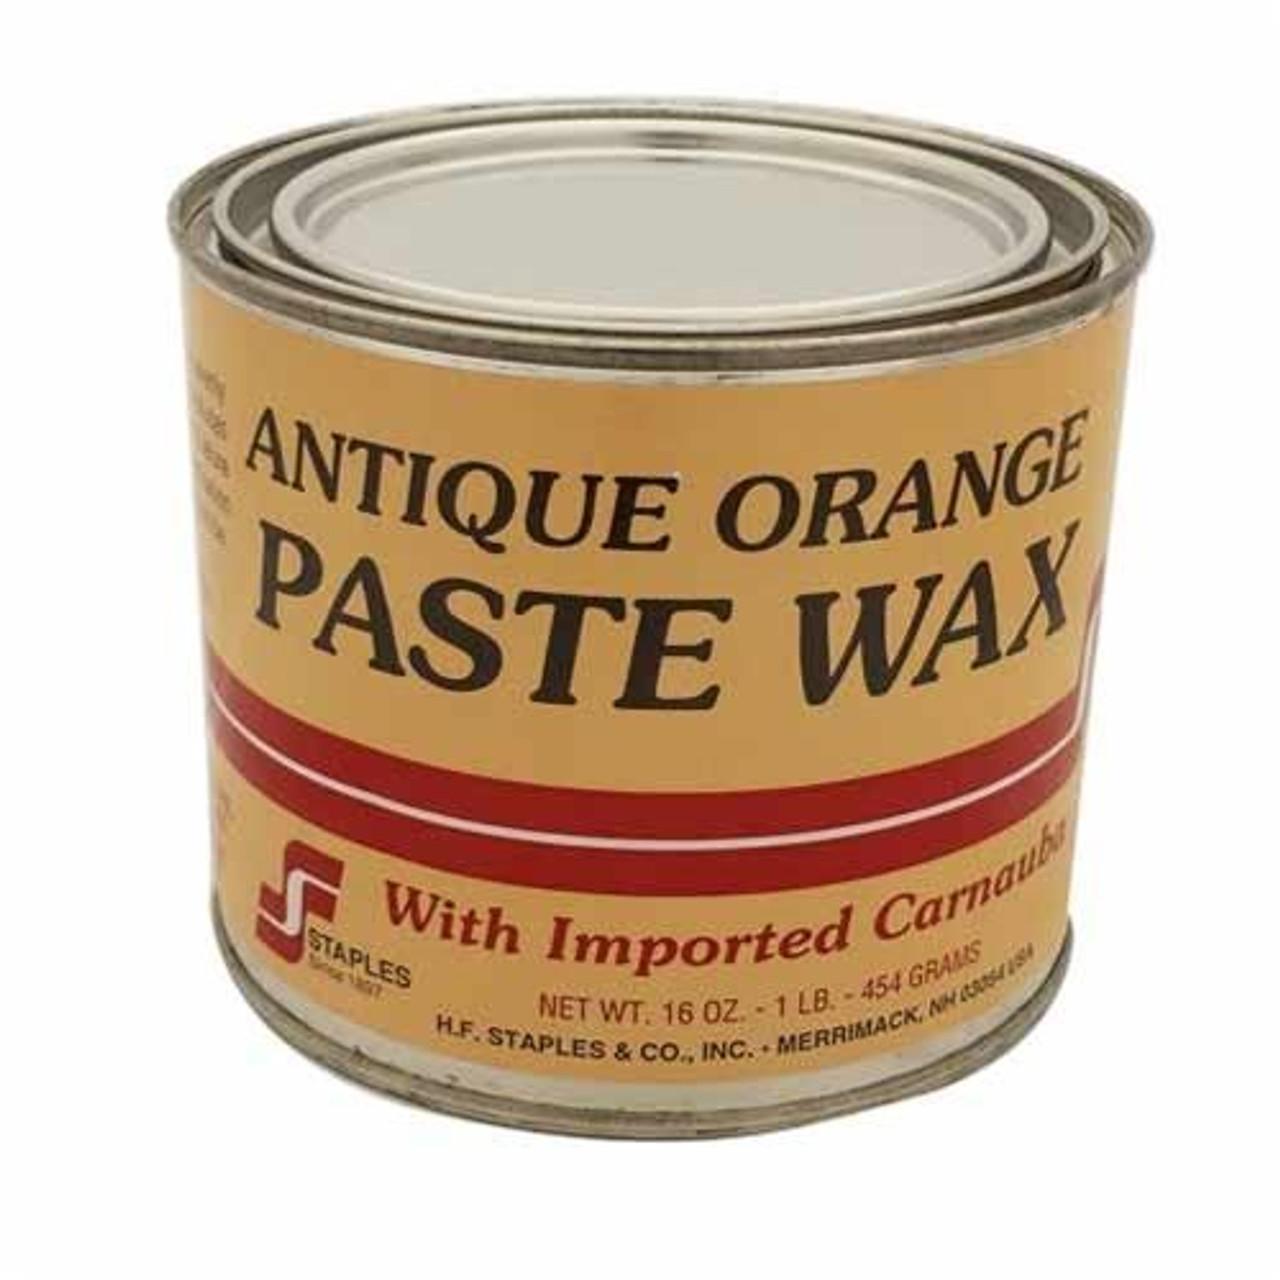 Paste Wax - Antique Orange